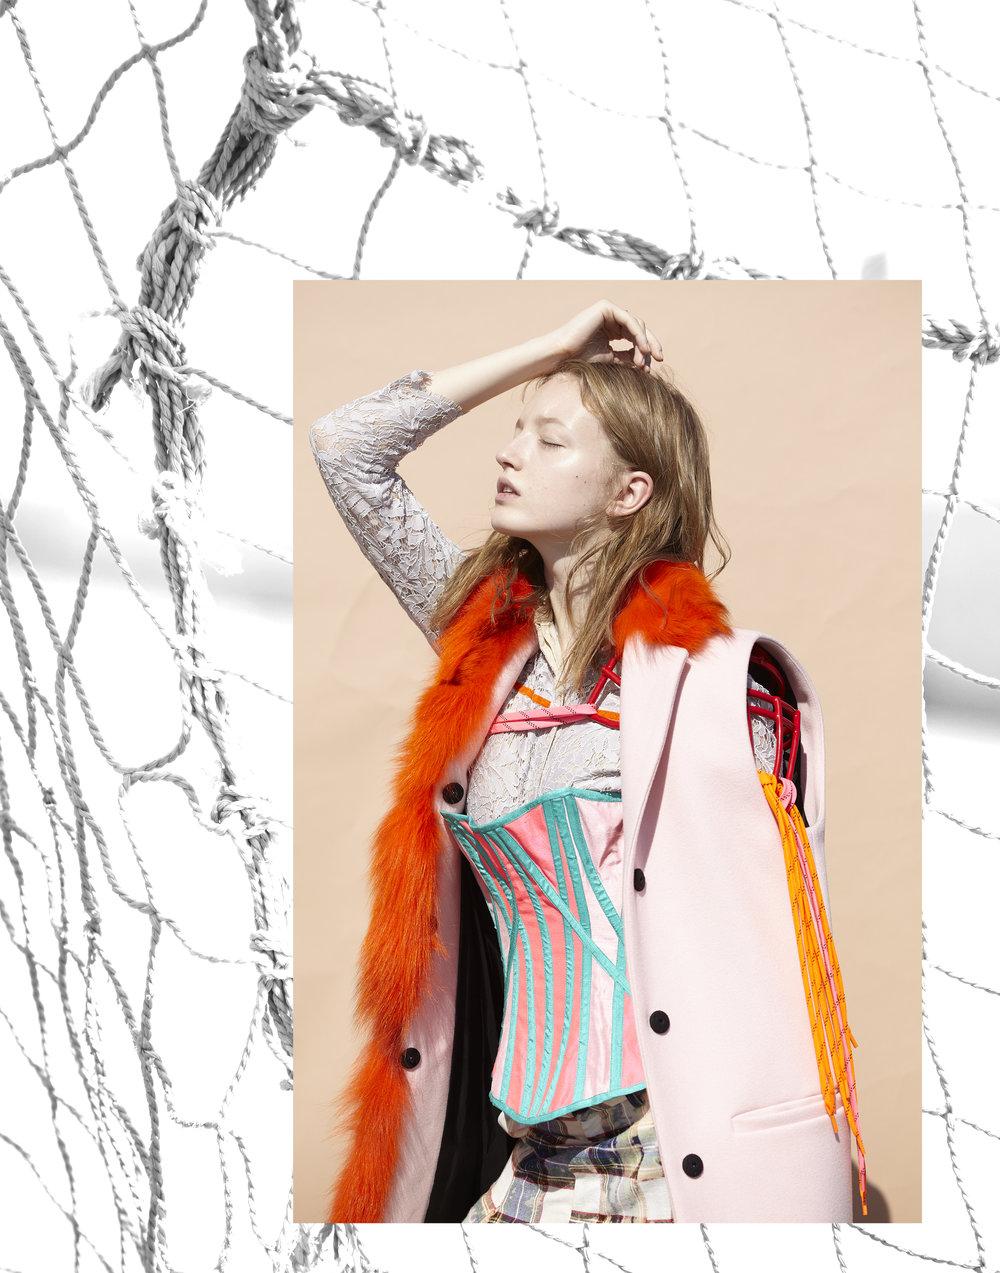 gilet + blouse  MSGM  corset  TOMO KOIZUMI , accessory STYLIST MADE, trousers  AKIKOAOKI